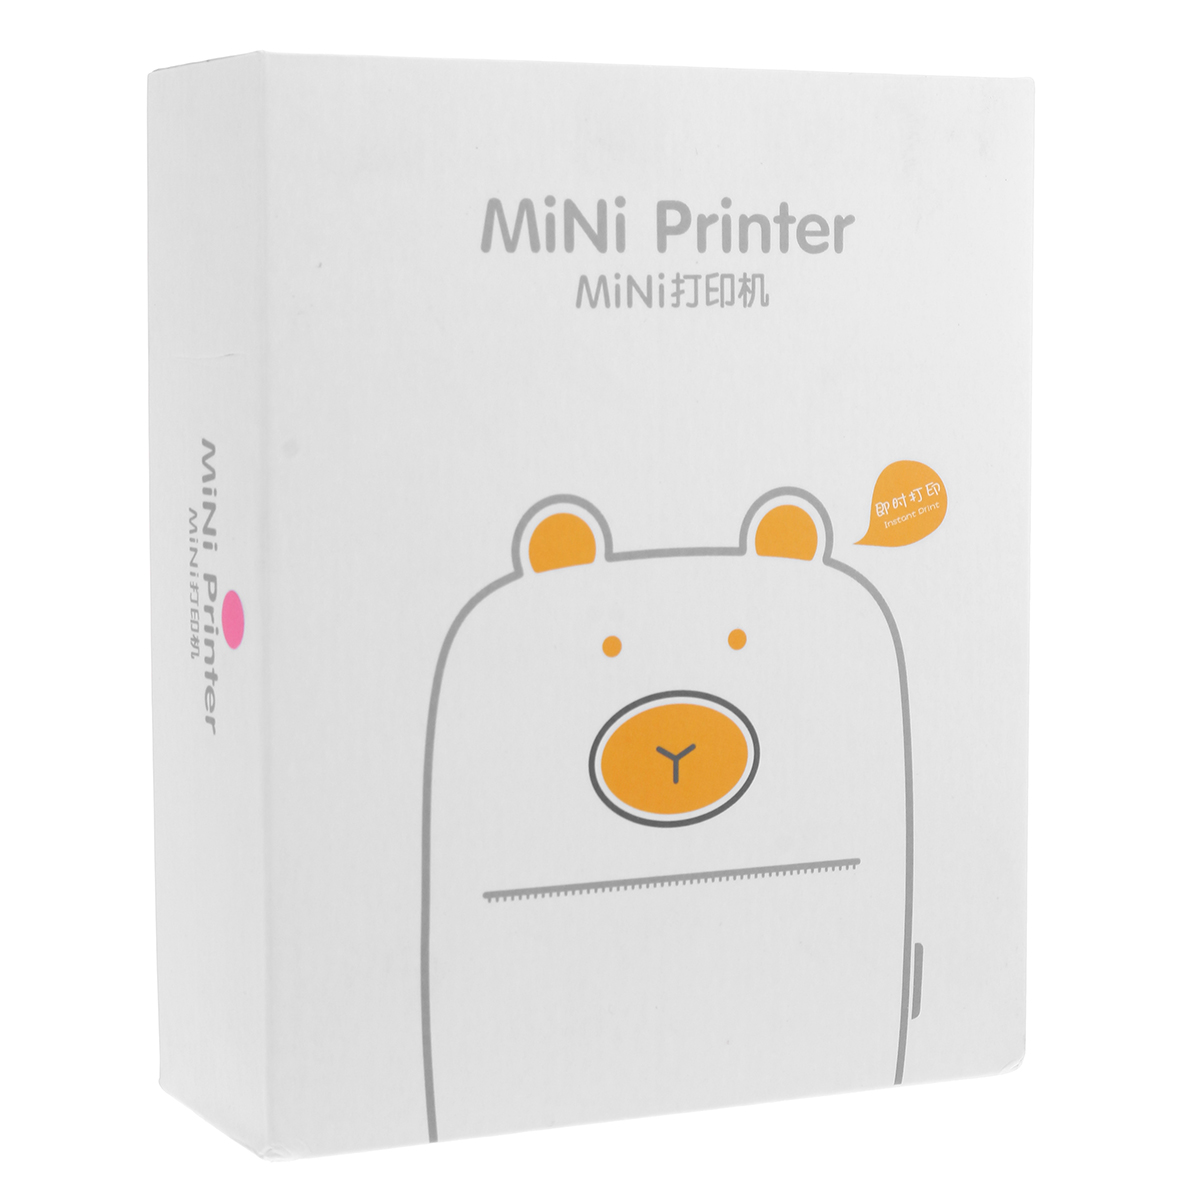 Wireless Mini Label Printer Portable Thermal Label Printer Pocket Label Maker La